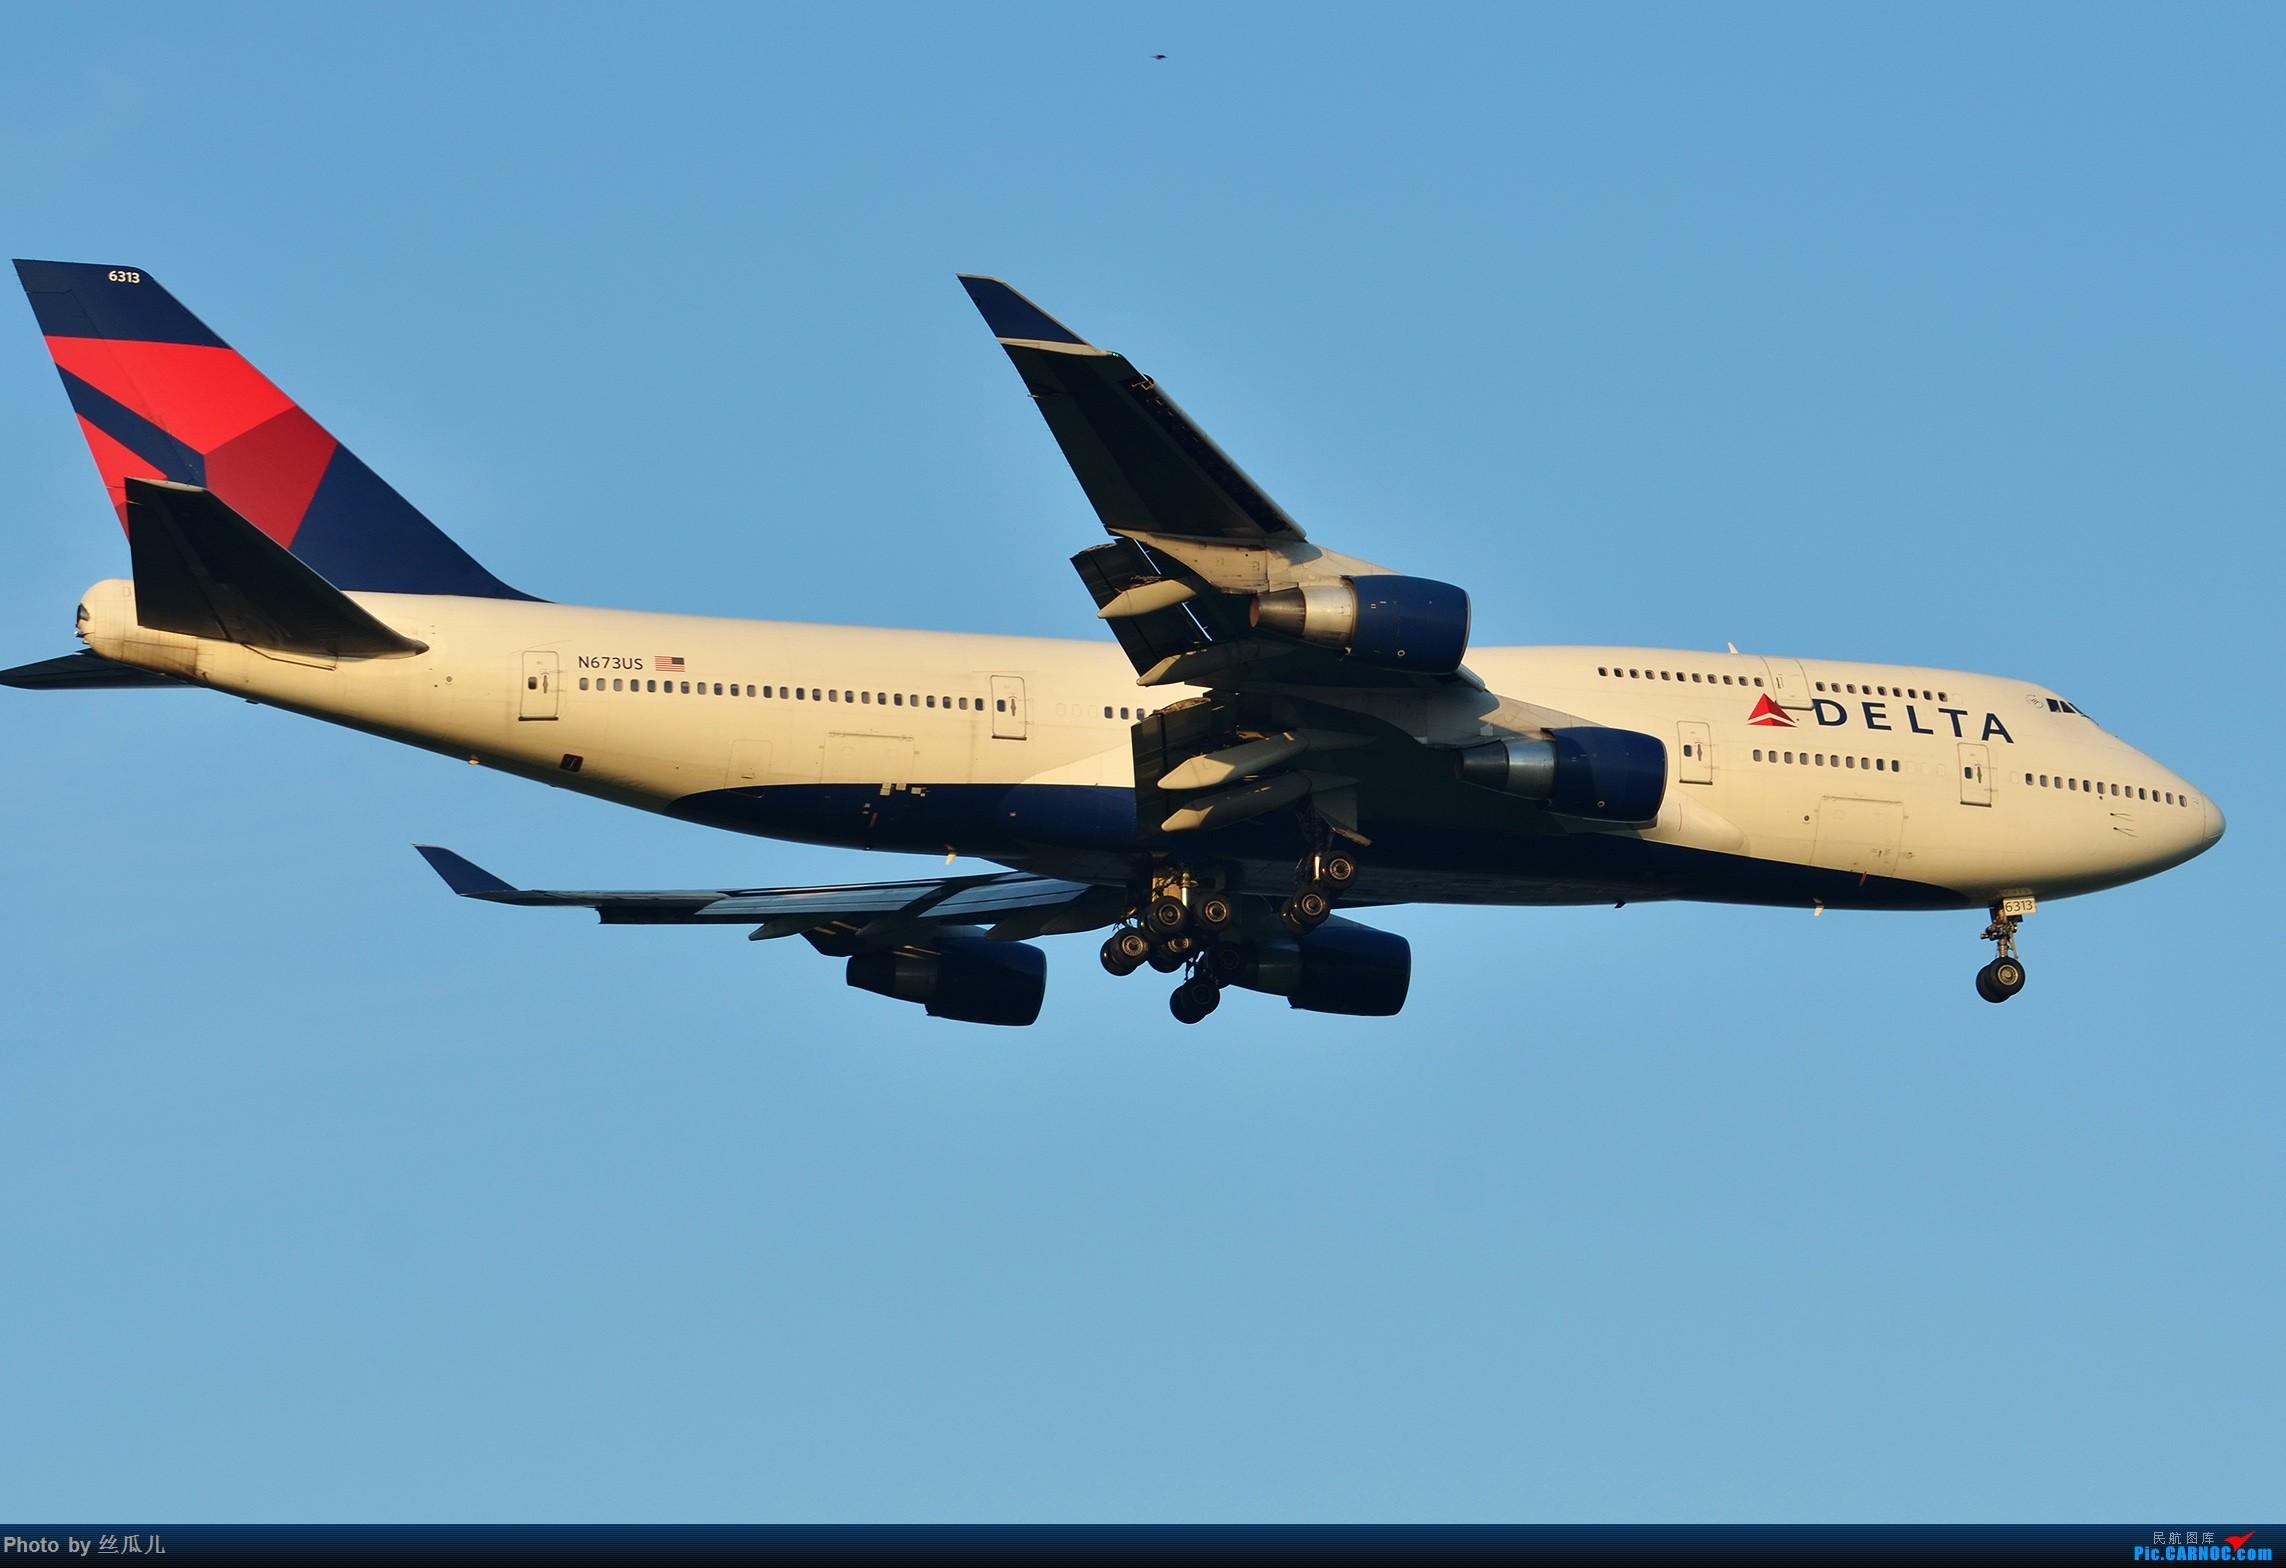 Re:[原创]【徘徊在HGH的丝瓜】瓜哥的高温福利再一波----7月20日的达美打包贴 BOEING 747-400 N673US 中国上海浦东国际机场